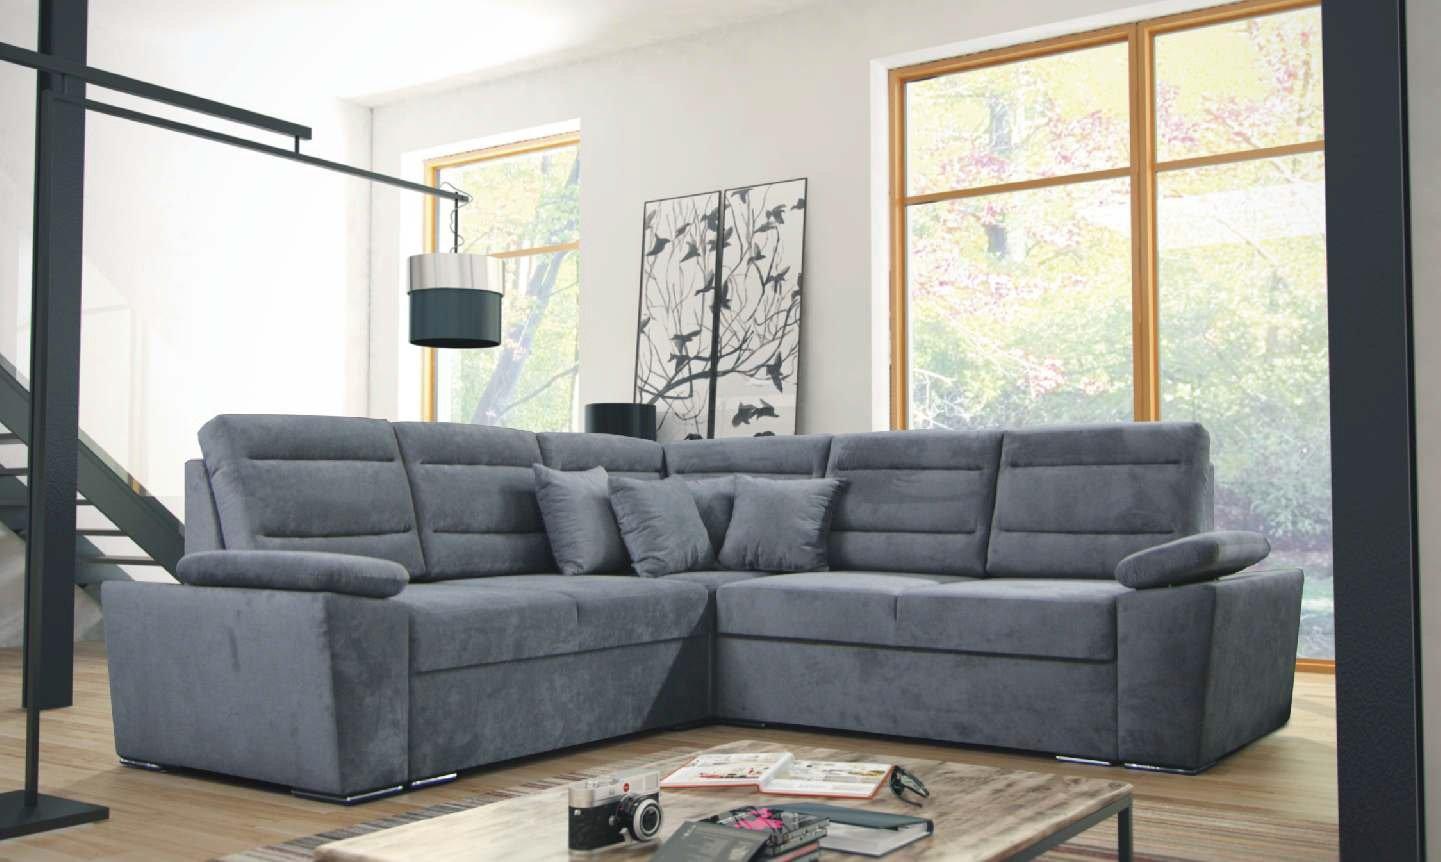 Savio gray sectional sofa by skyler designs for Sectional sofa names